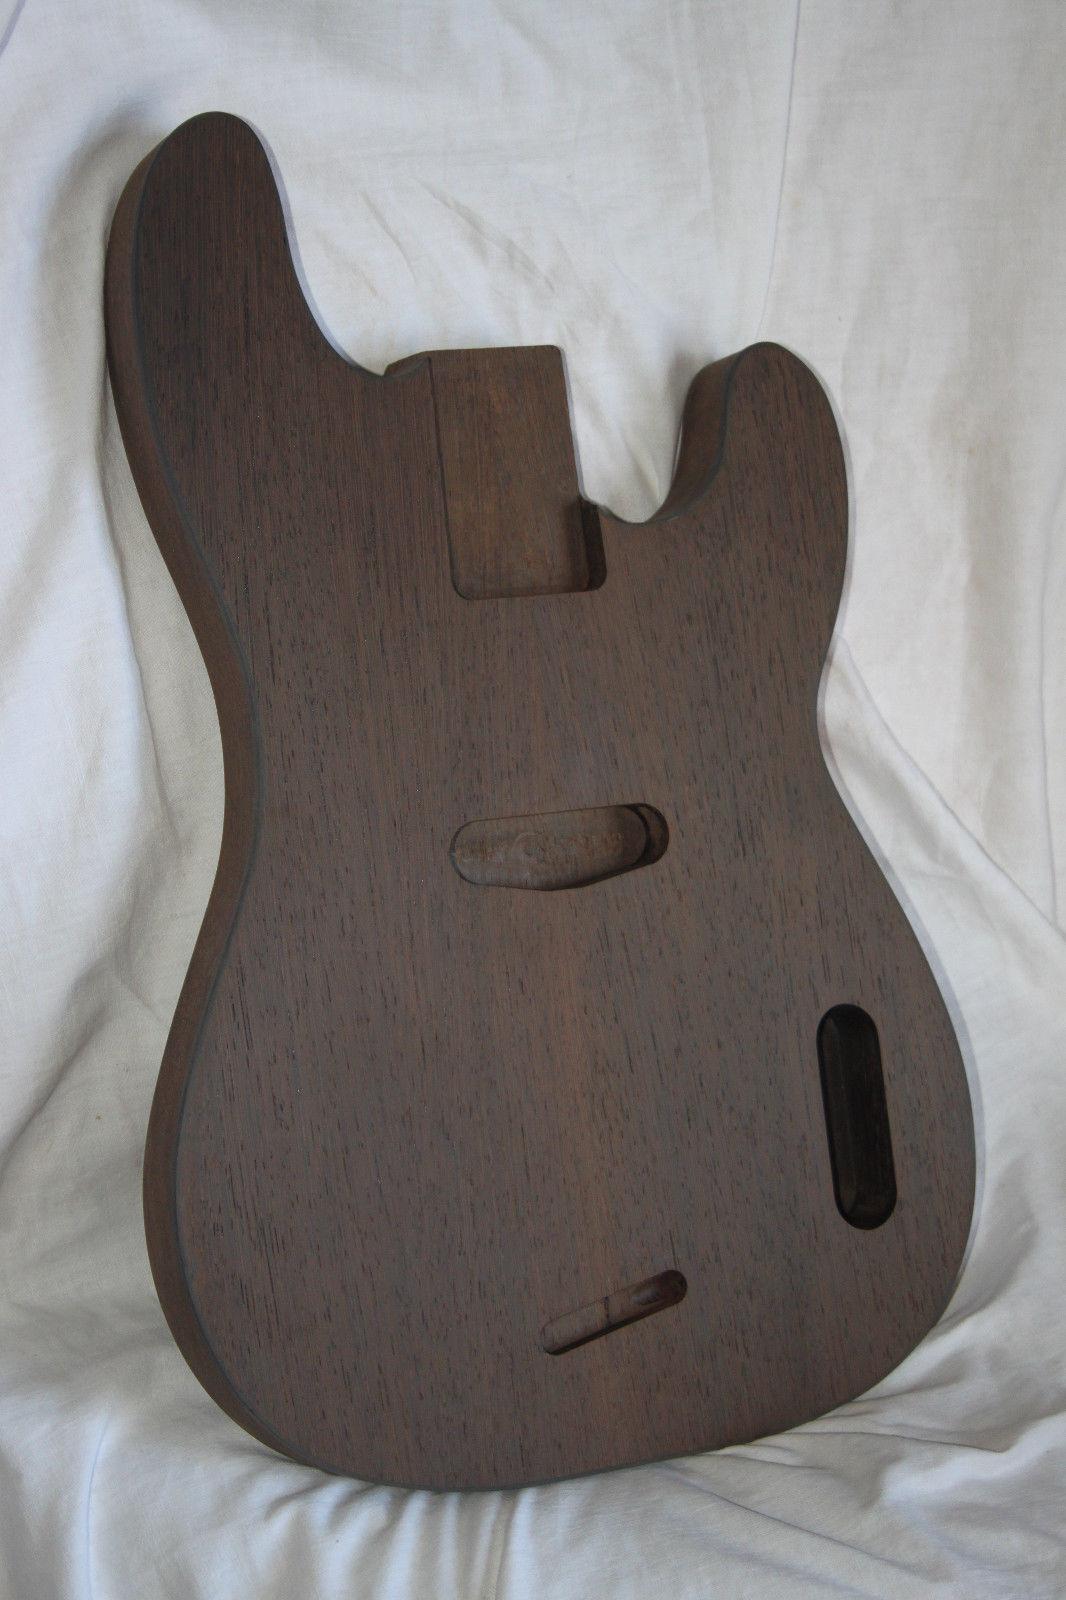 2 Fender P J Bass corpi VINTAGE 51 wengè, hand made, spedizione world